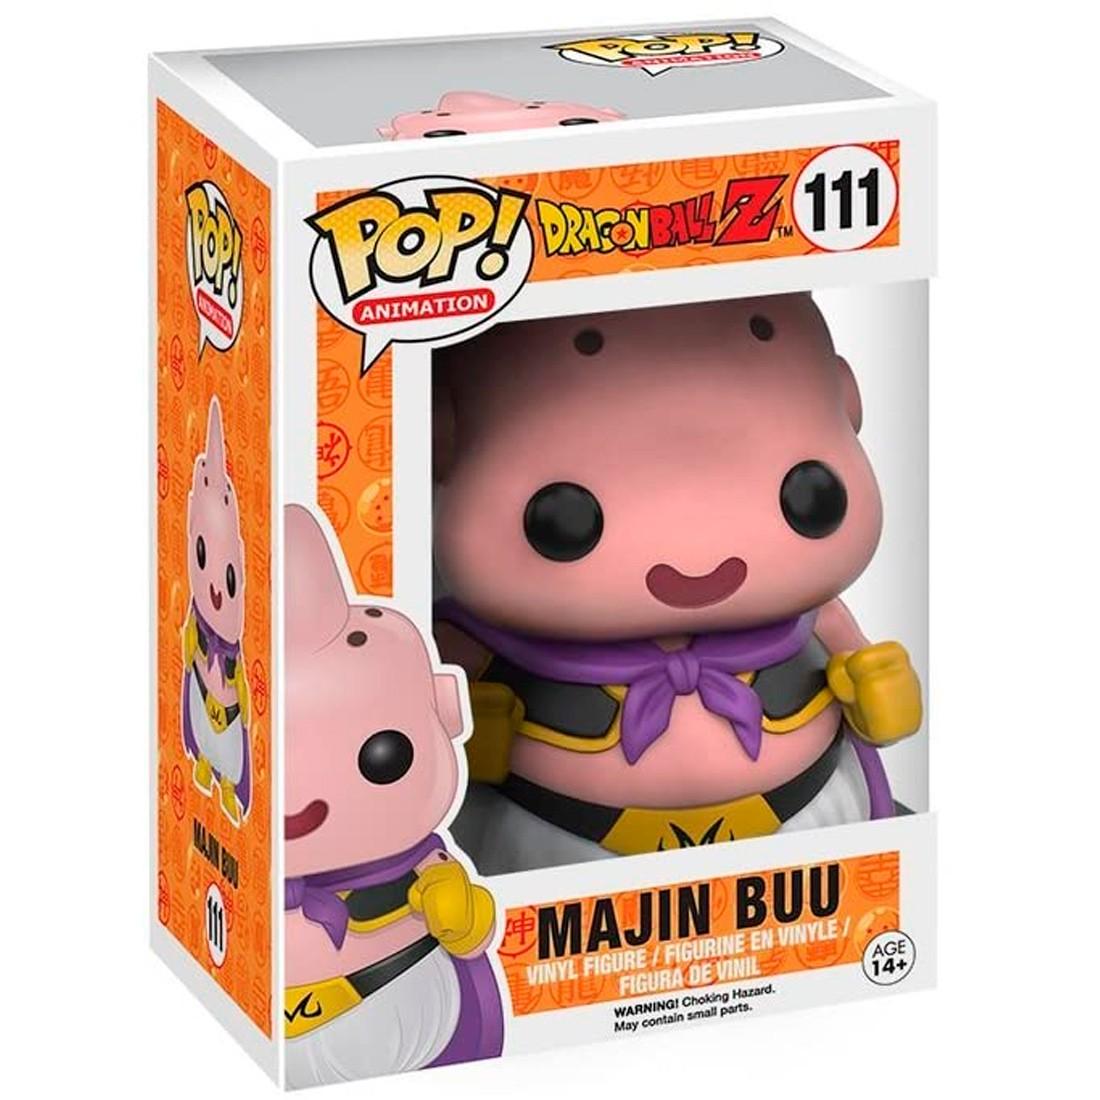 Funko Pop! Animation Dragon Ball Z 111 Majin Buu